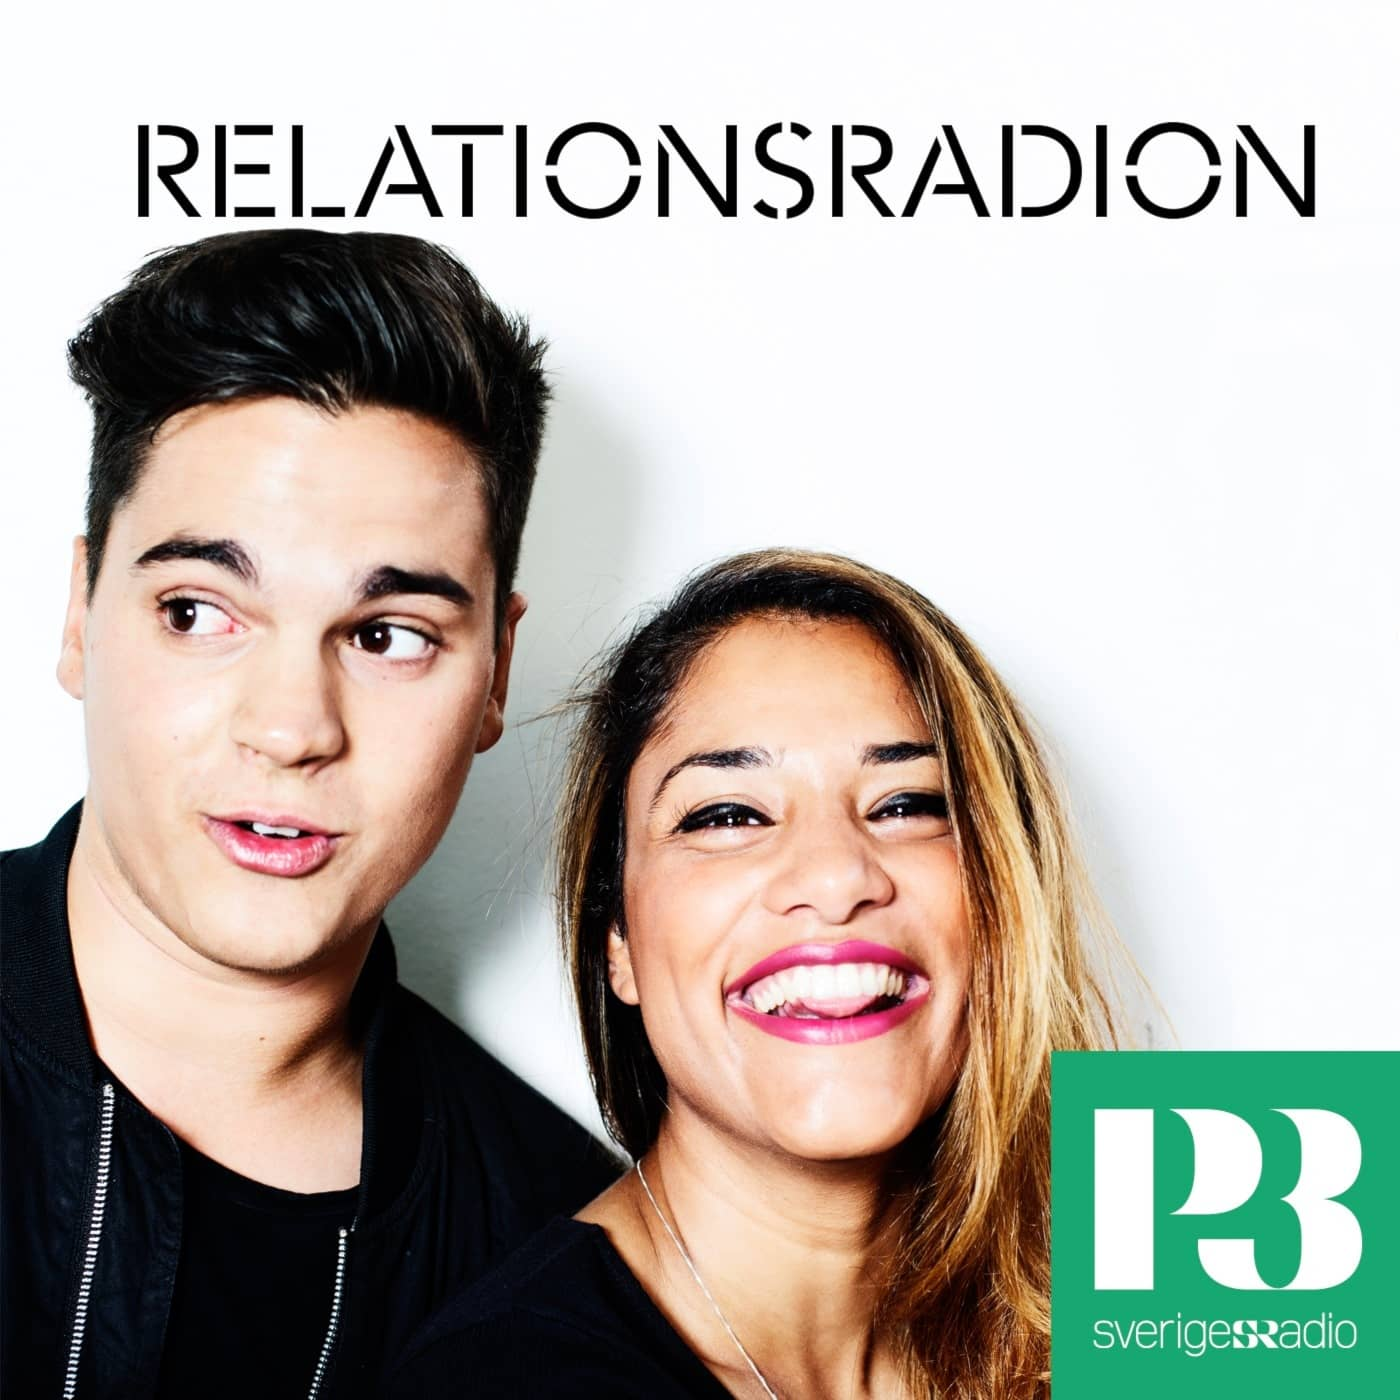 Relationsradion